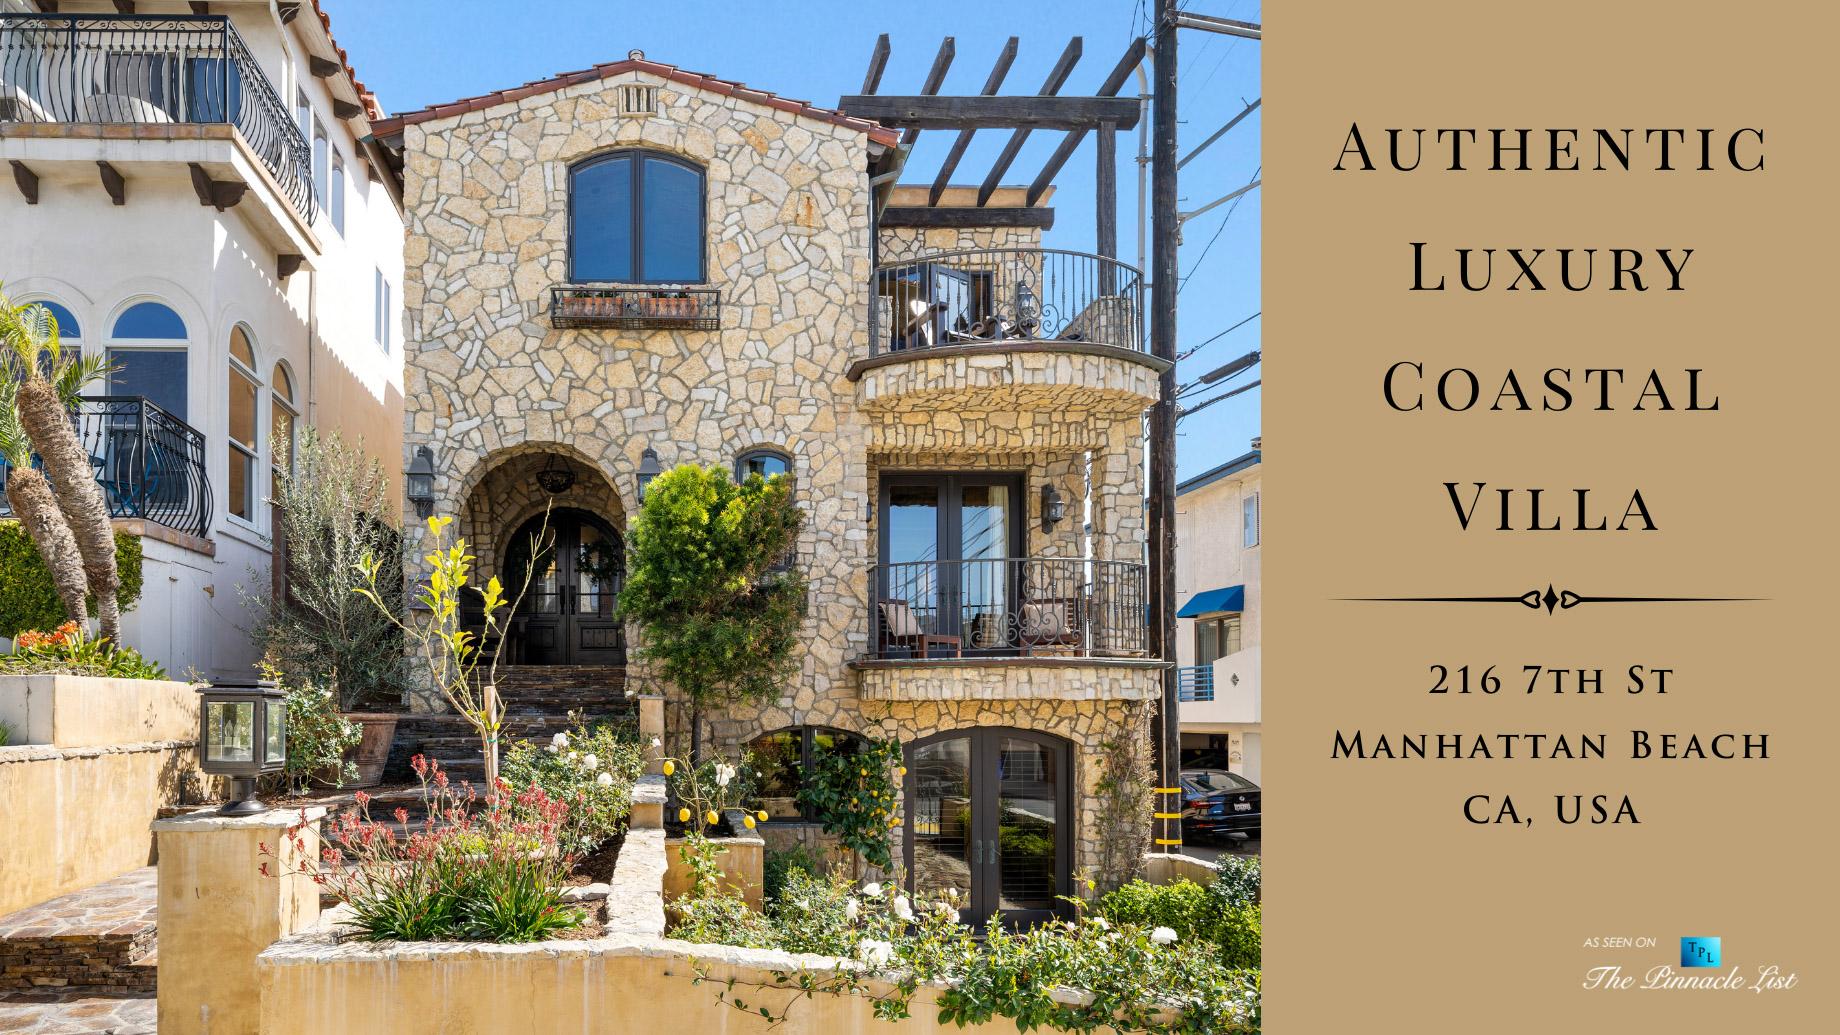 Authentic Luxury Coastal Villa - 216 7th St, Manhattan Beach, CA, USA